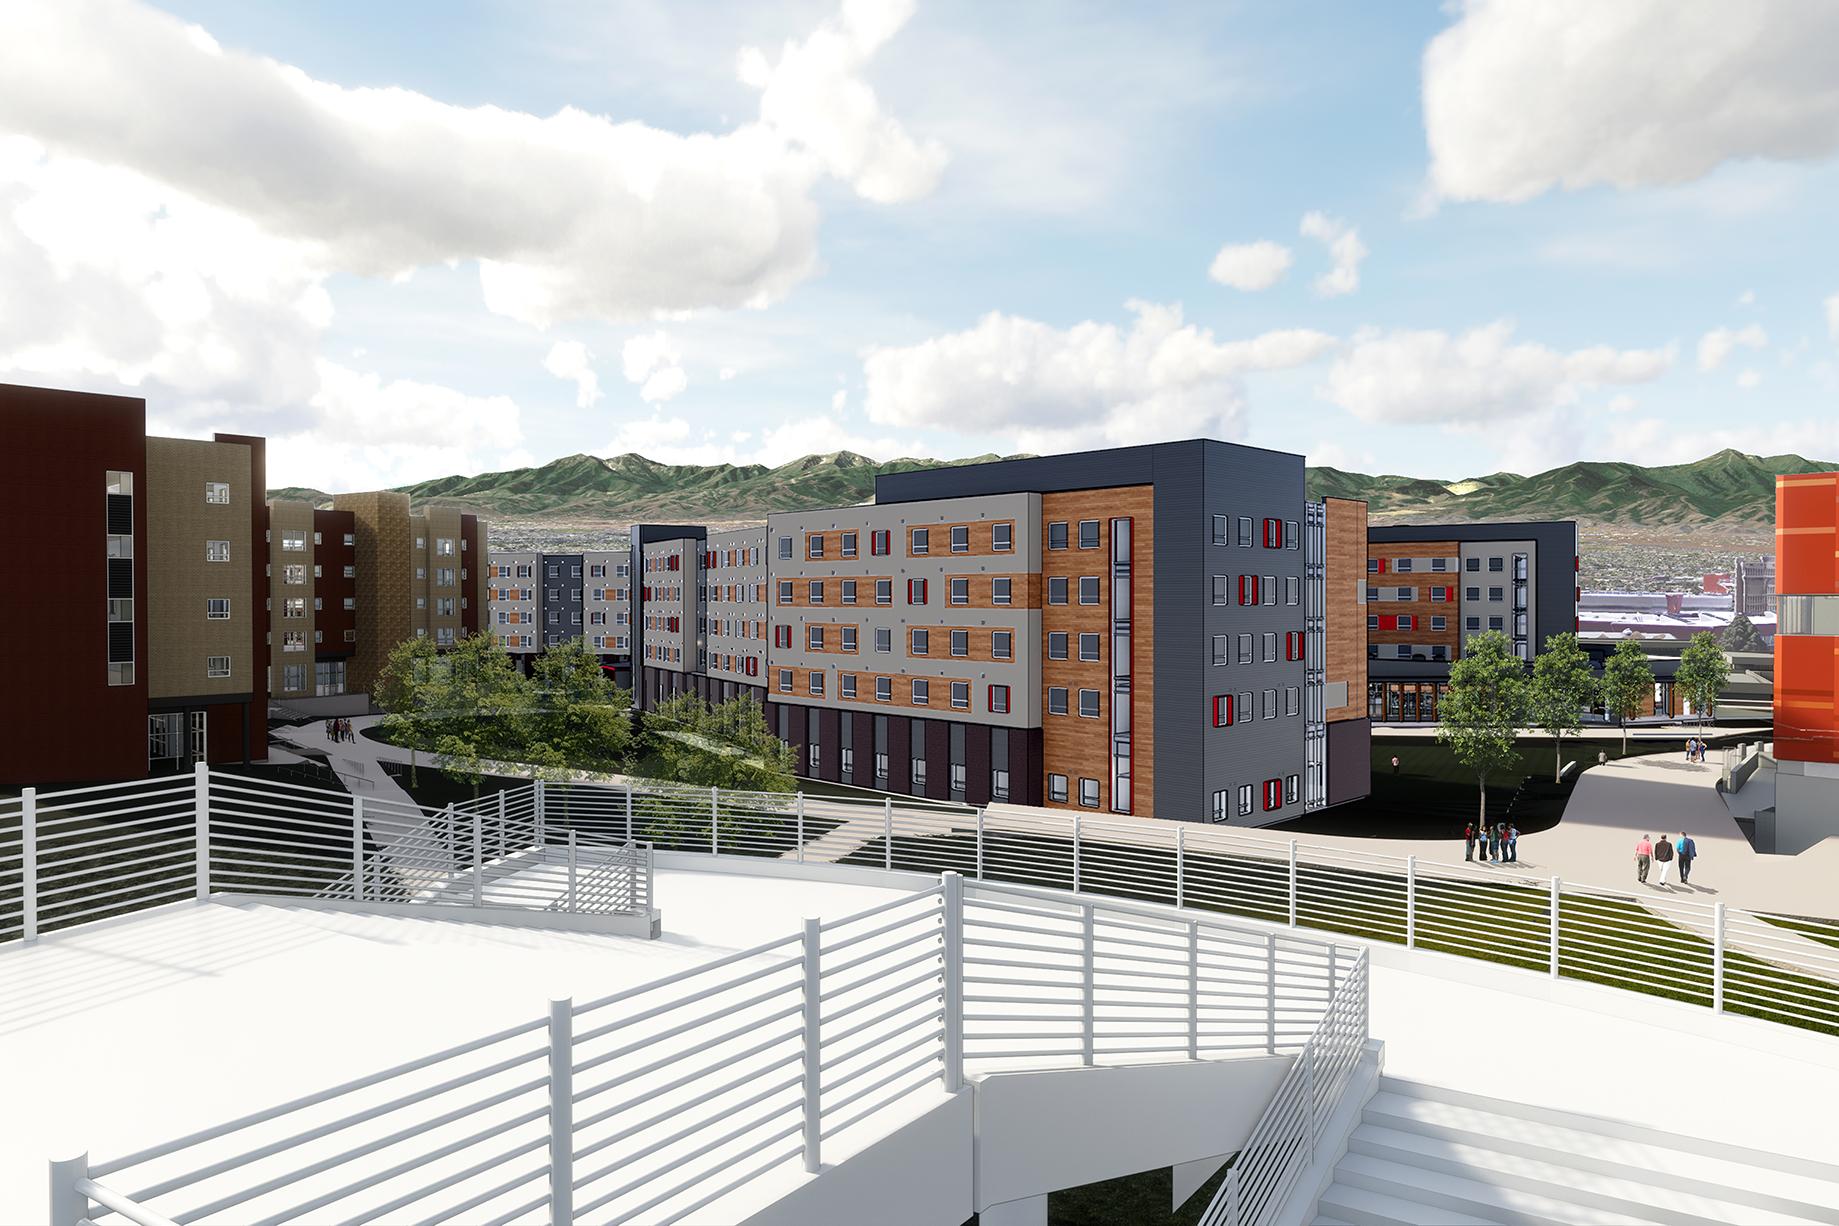 Kahlert Village rendering from Legacy Bridge